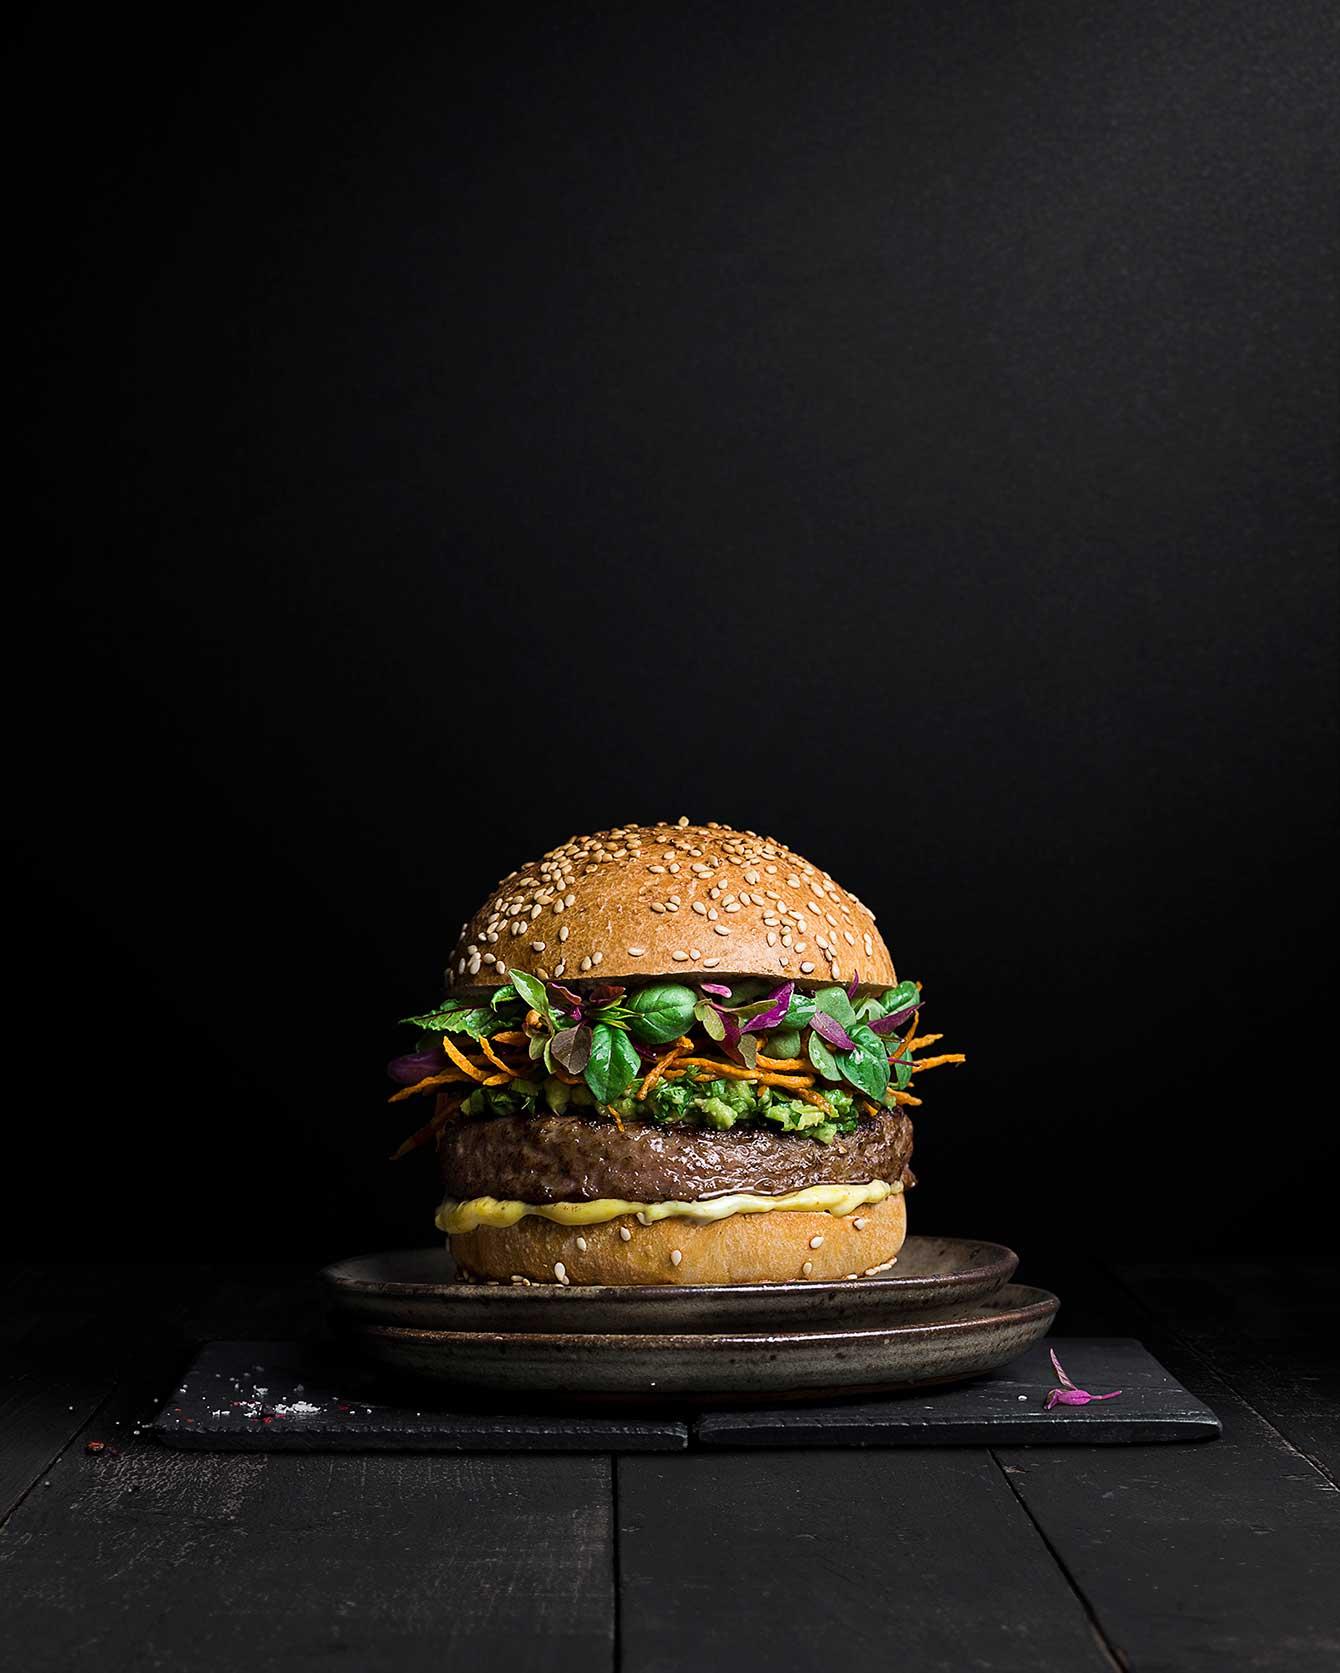 hamburguesa-la-crianza-estudio-como